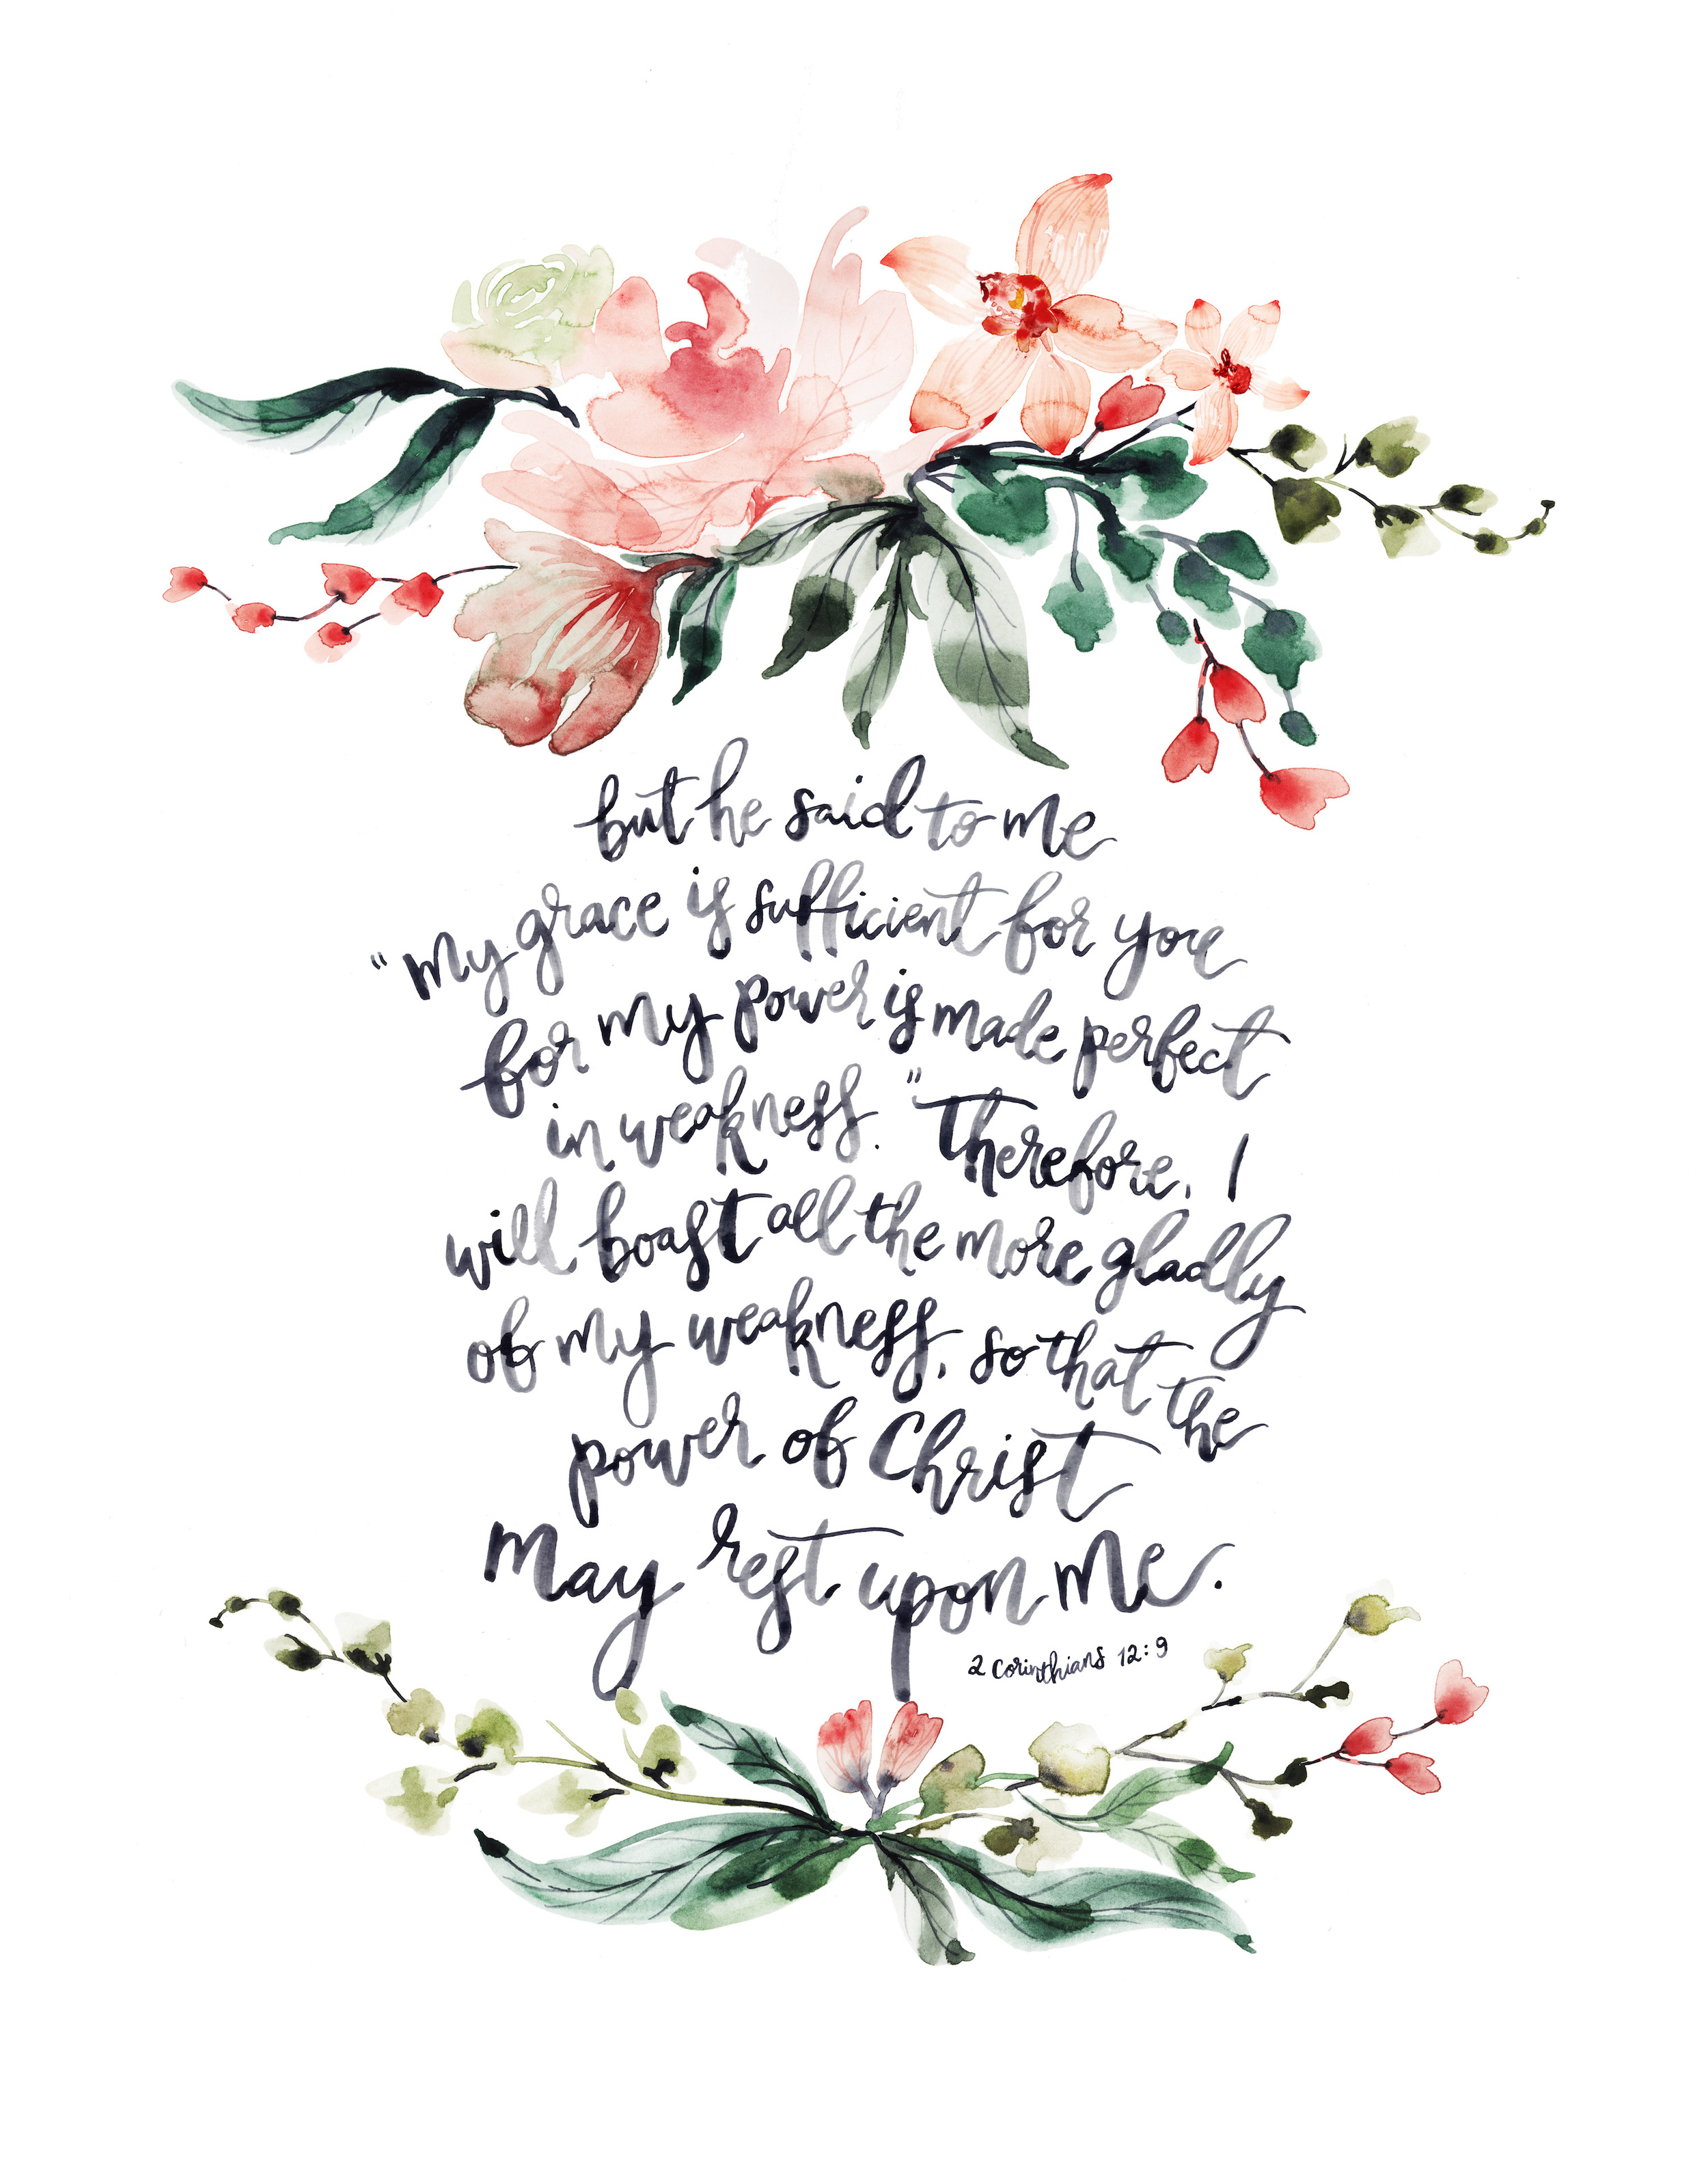 2 Corinthians 12-9.jpg